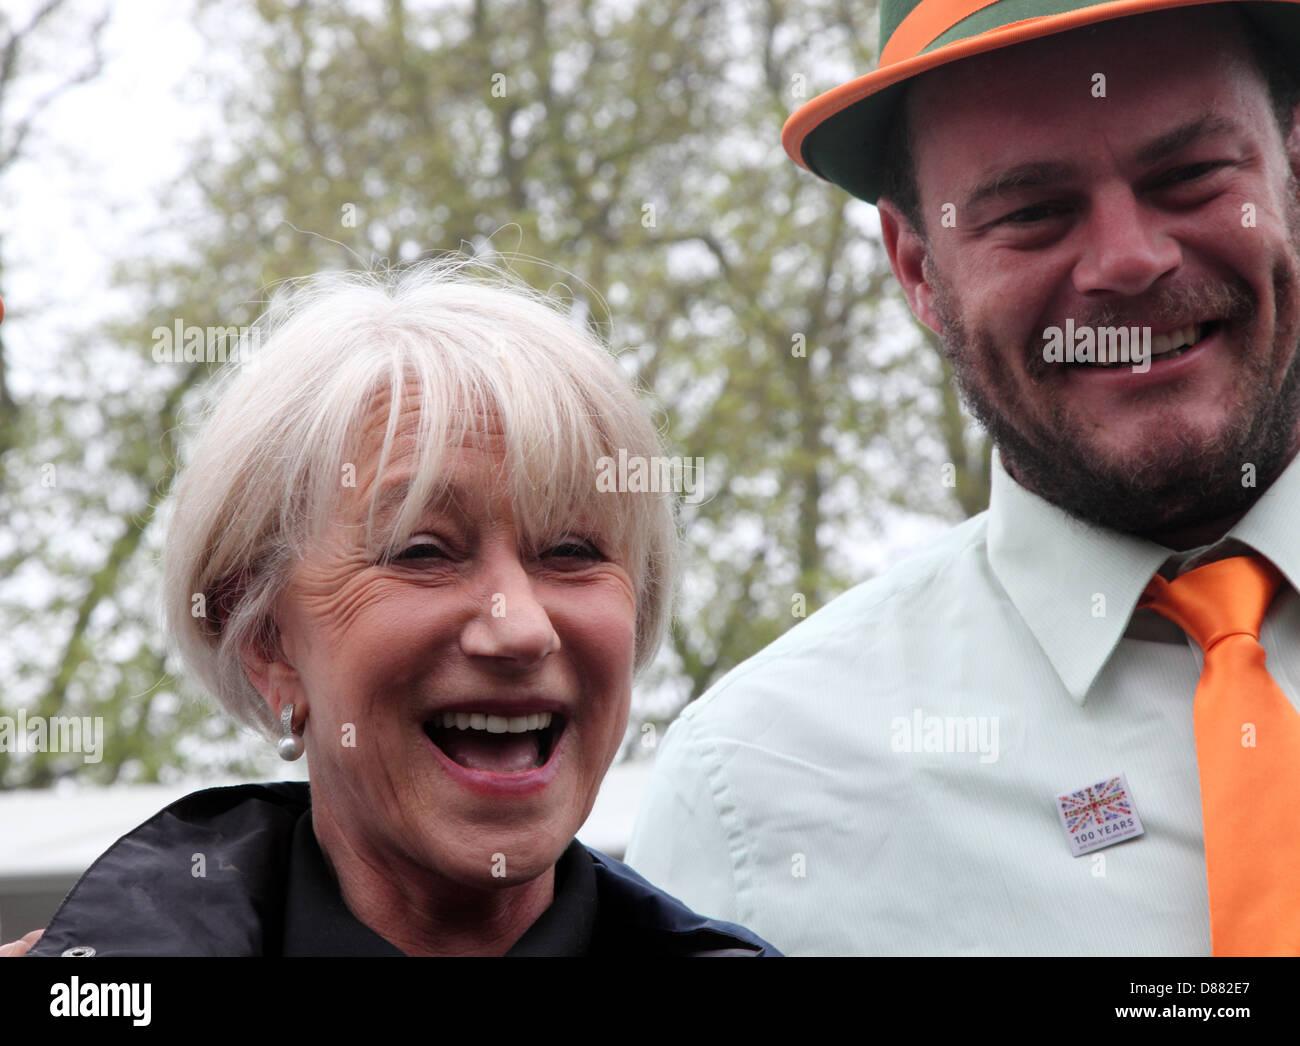 Dame Helen Mirren admires Flemings Trailfinders Australian Garden at RHS Chelsea Flower Show 2013 - Stock Image